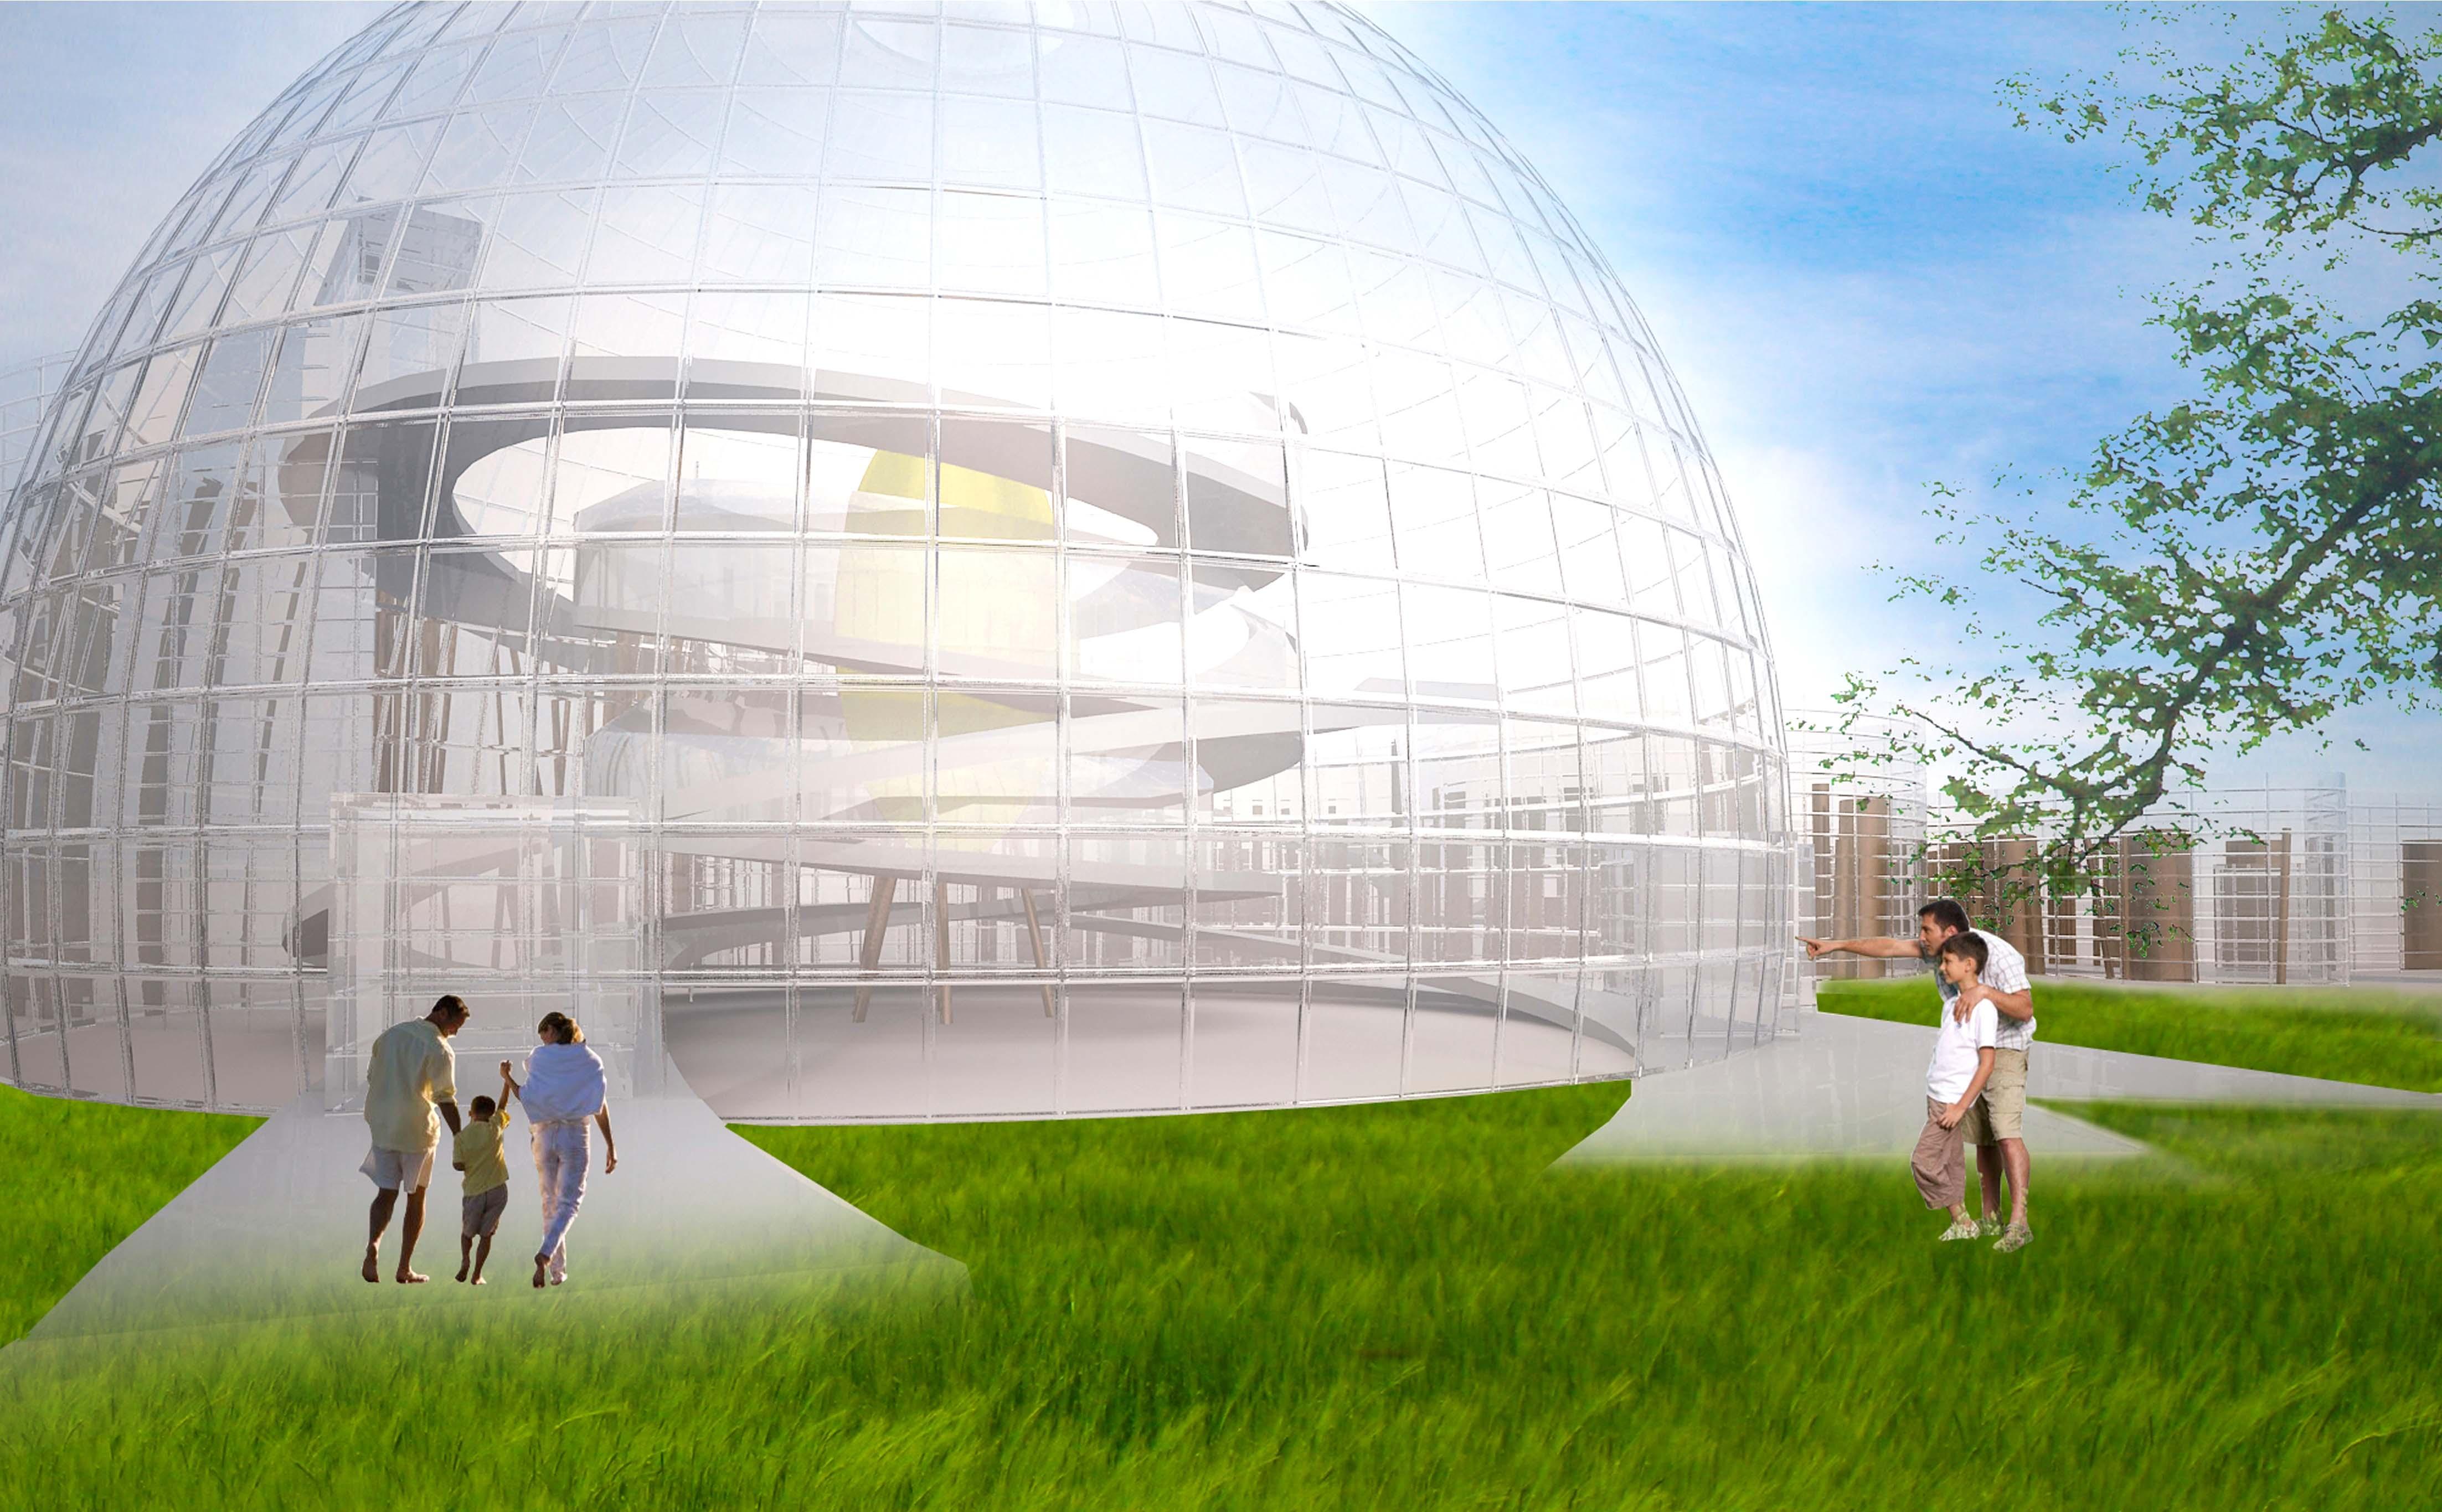 Stefano Tordiglione - stdesign - ST Design - architecture - interior - Yingkou 2